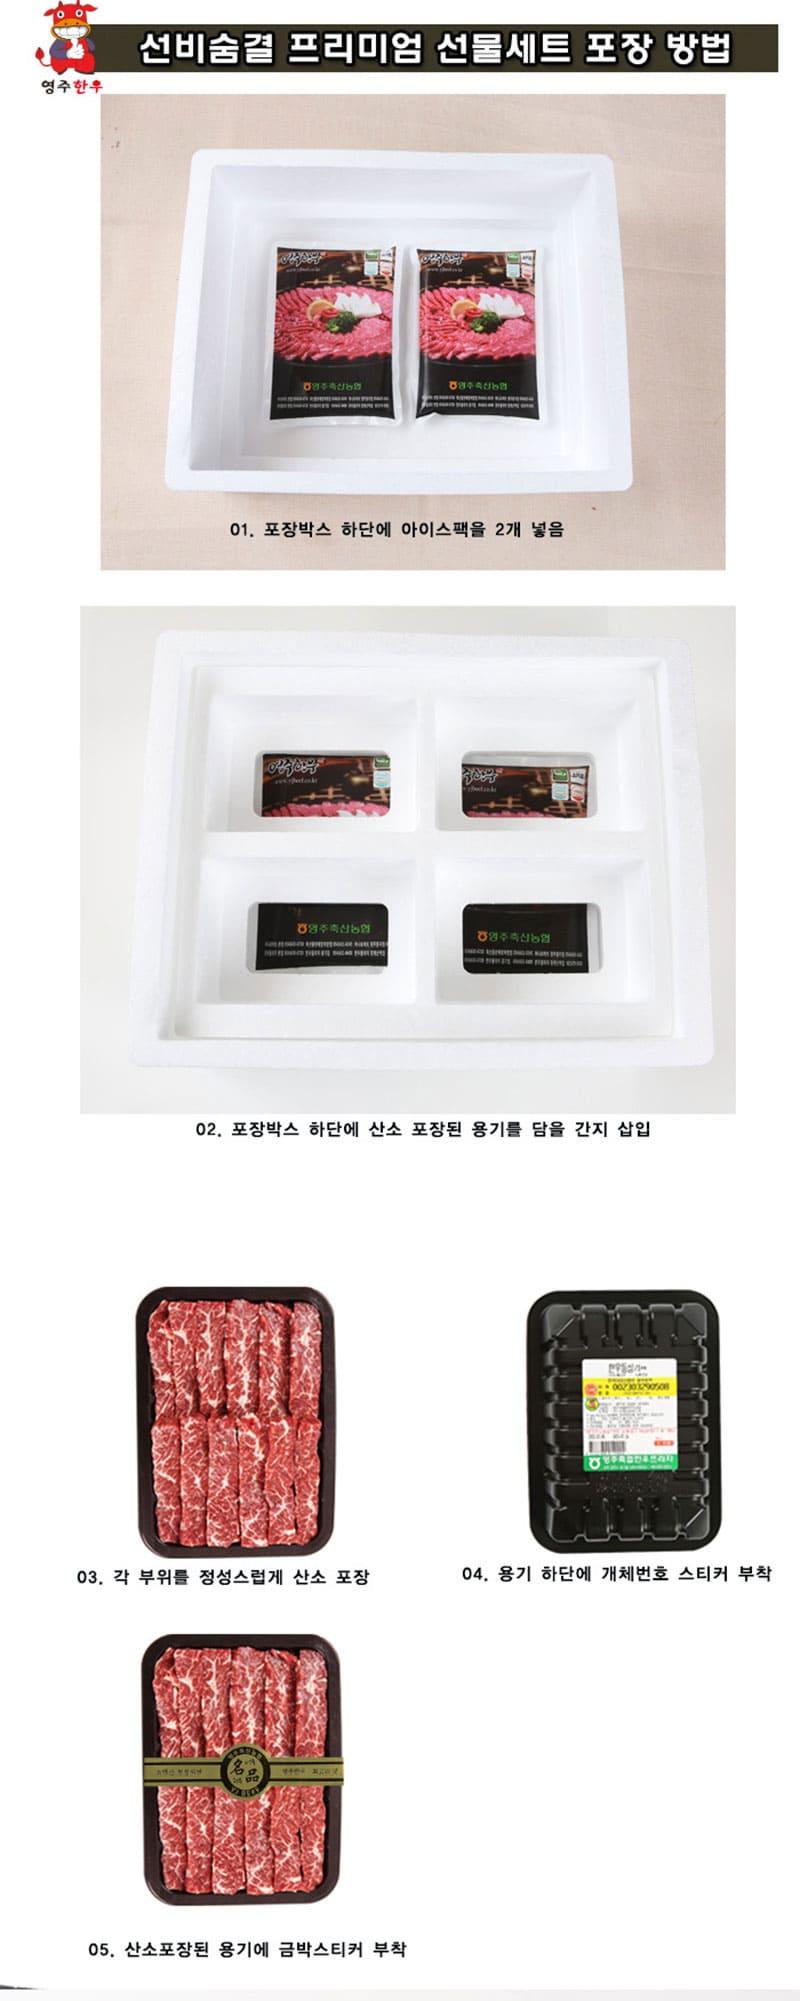 yeongjuchughyeob-myeongpum-set_detail_06.jpg